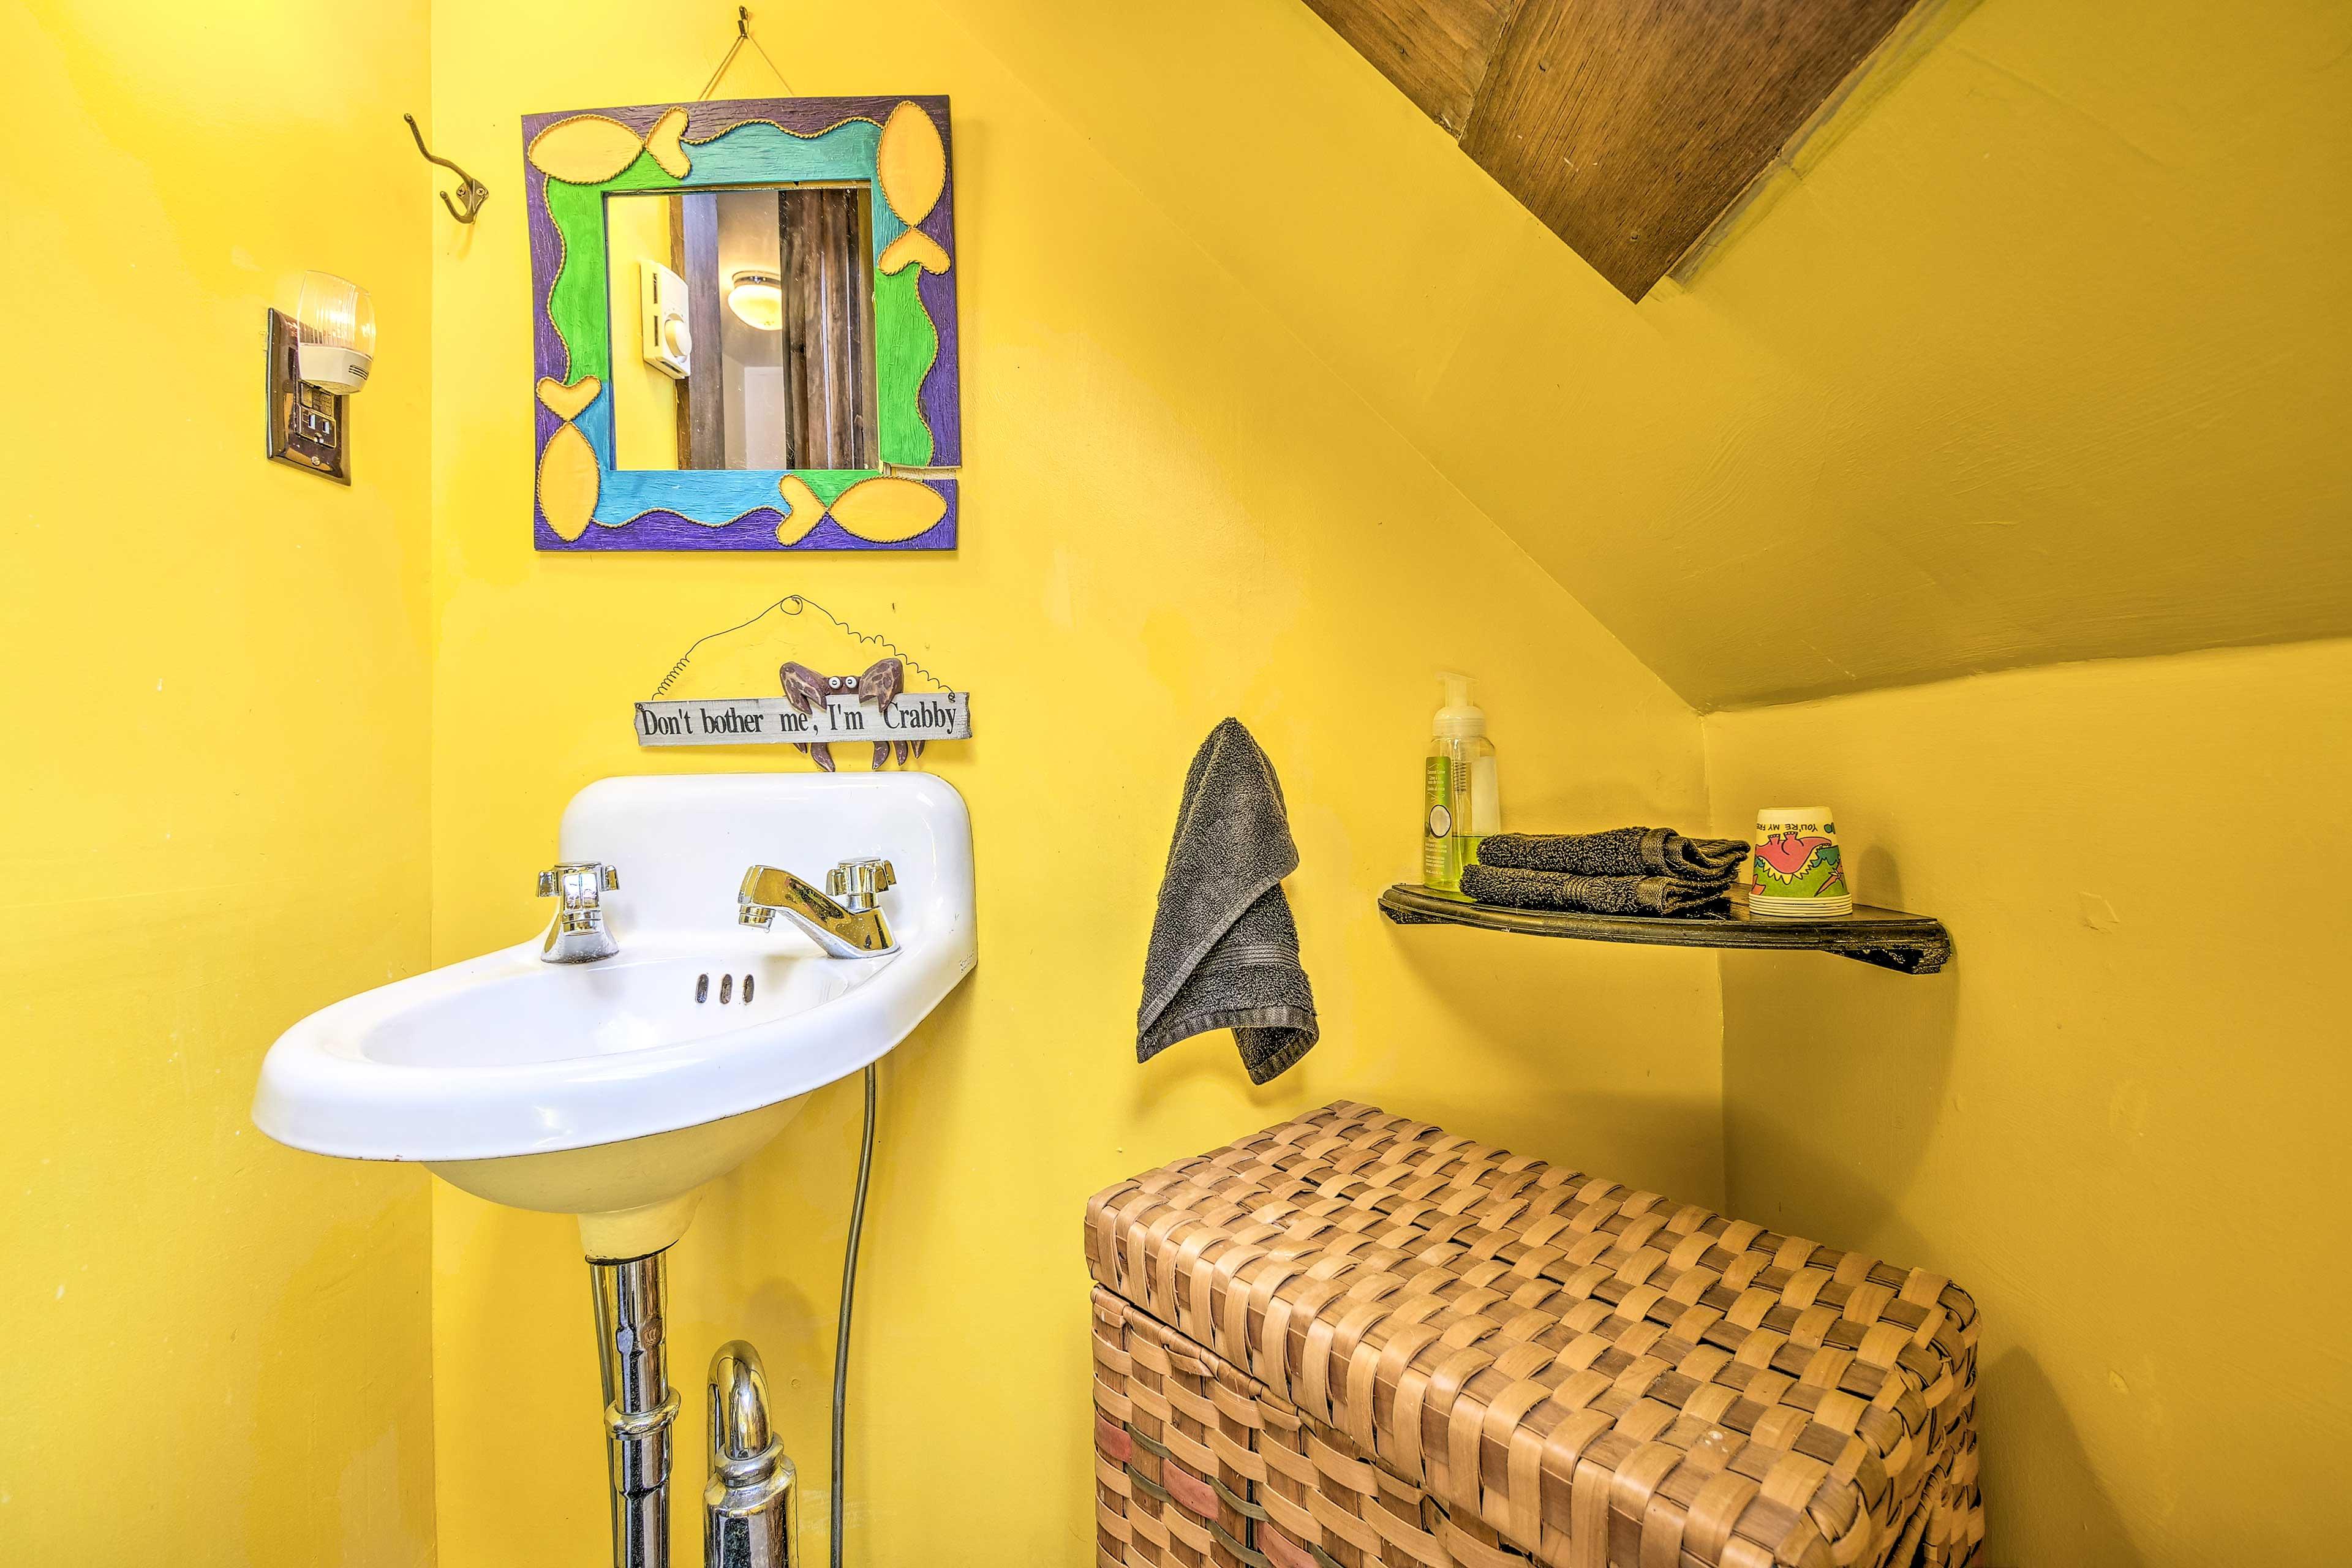 Brighten up your morning in bathroom 2.